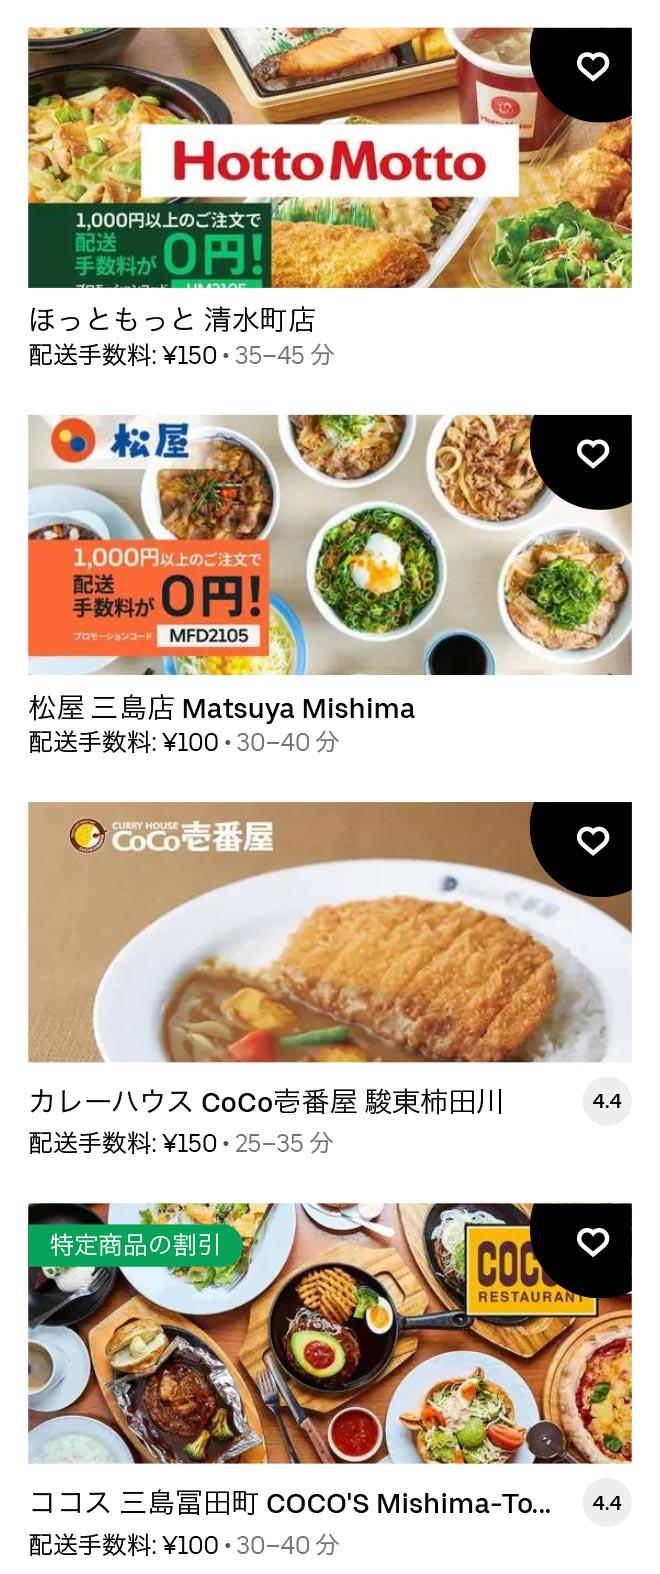 U mishima 2105 04